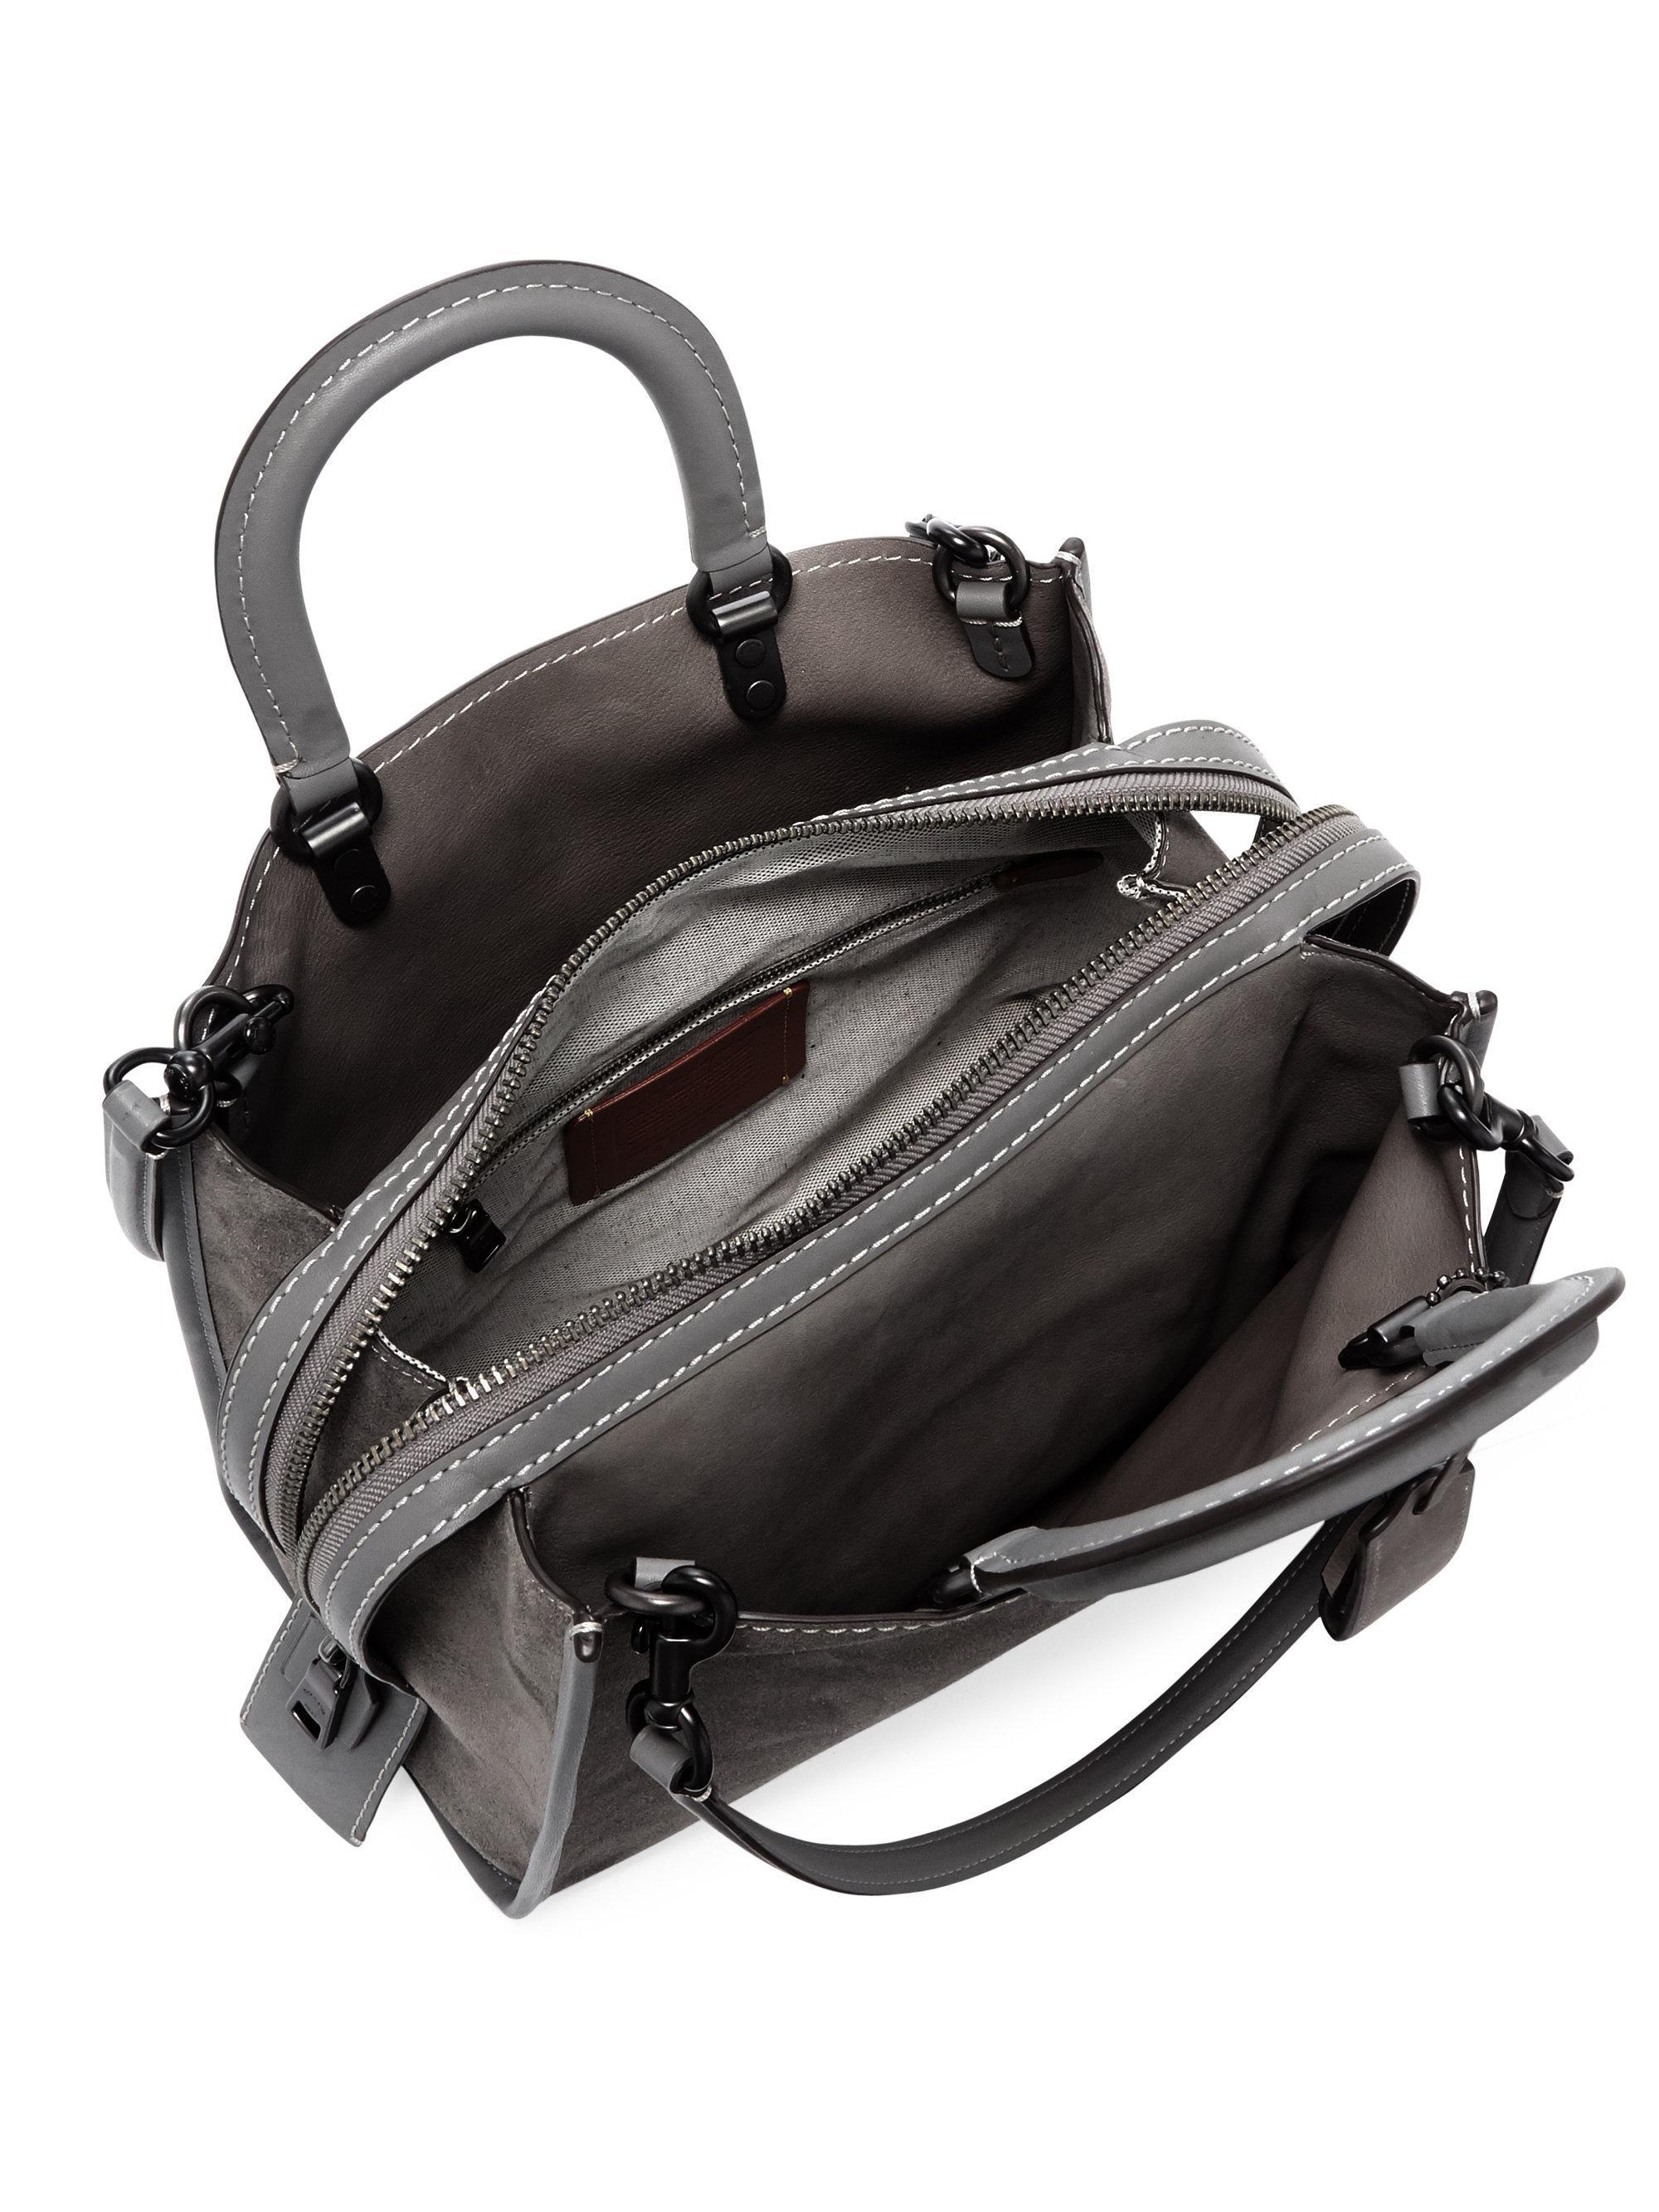 3f2f58766f0e Lyst - COACH Rogue Suede Shoulder Bag in Gray